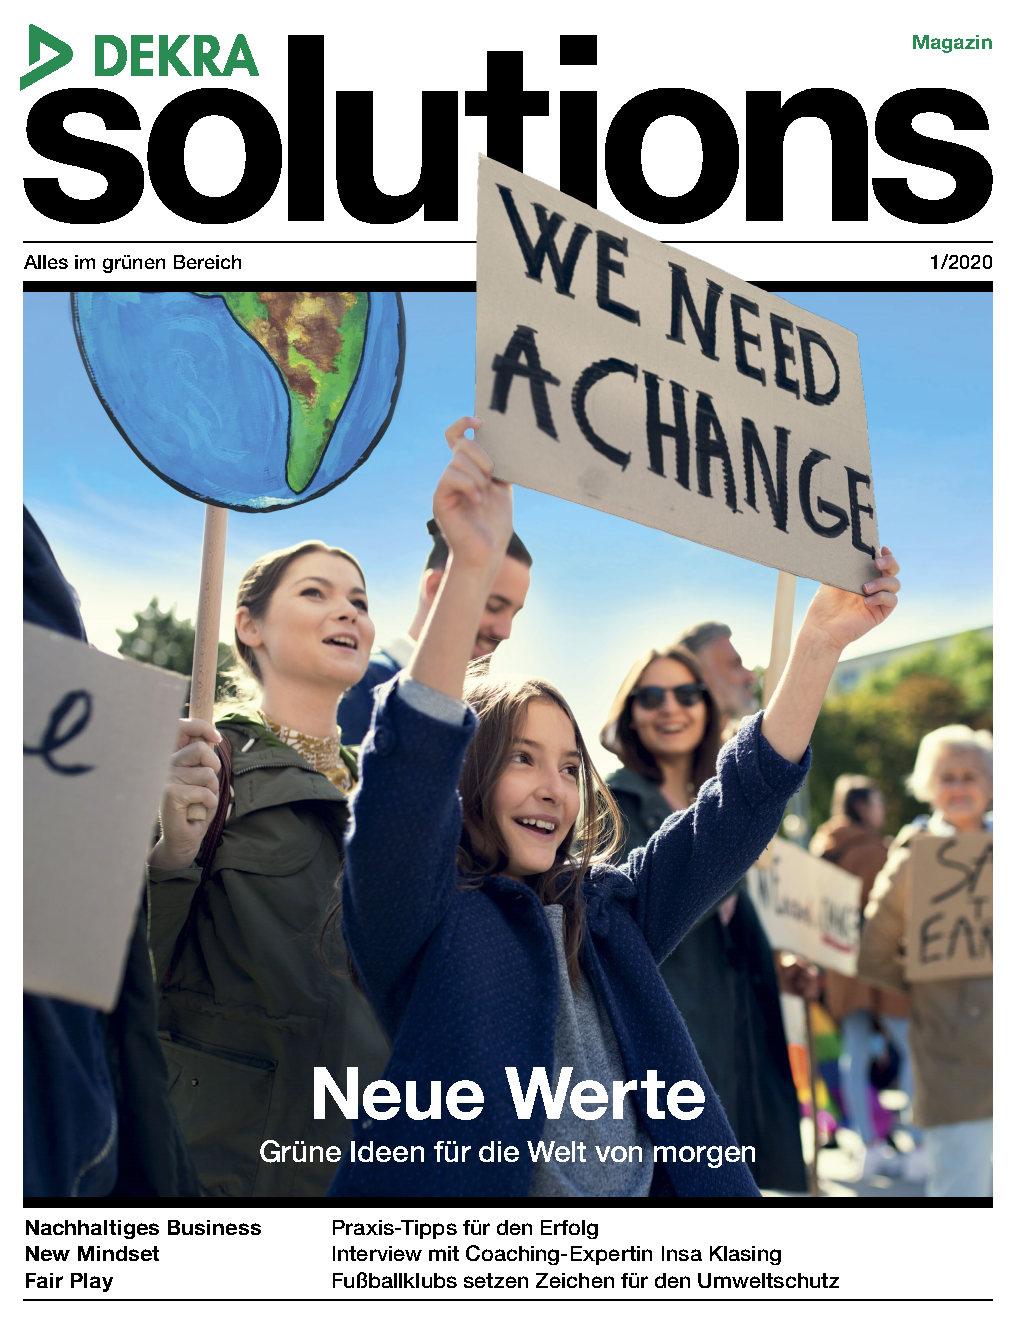 DEKRA solutions Magazin 1/2020